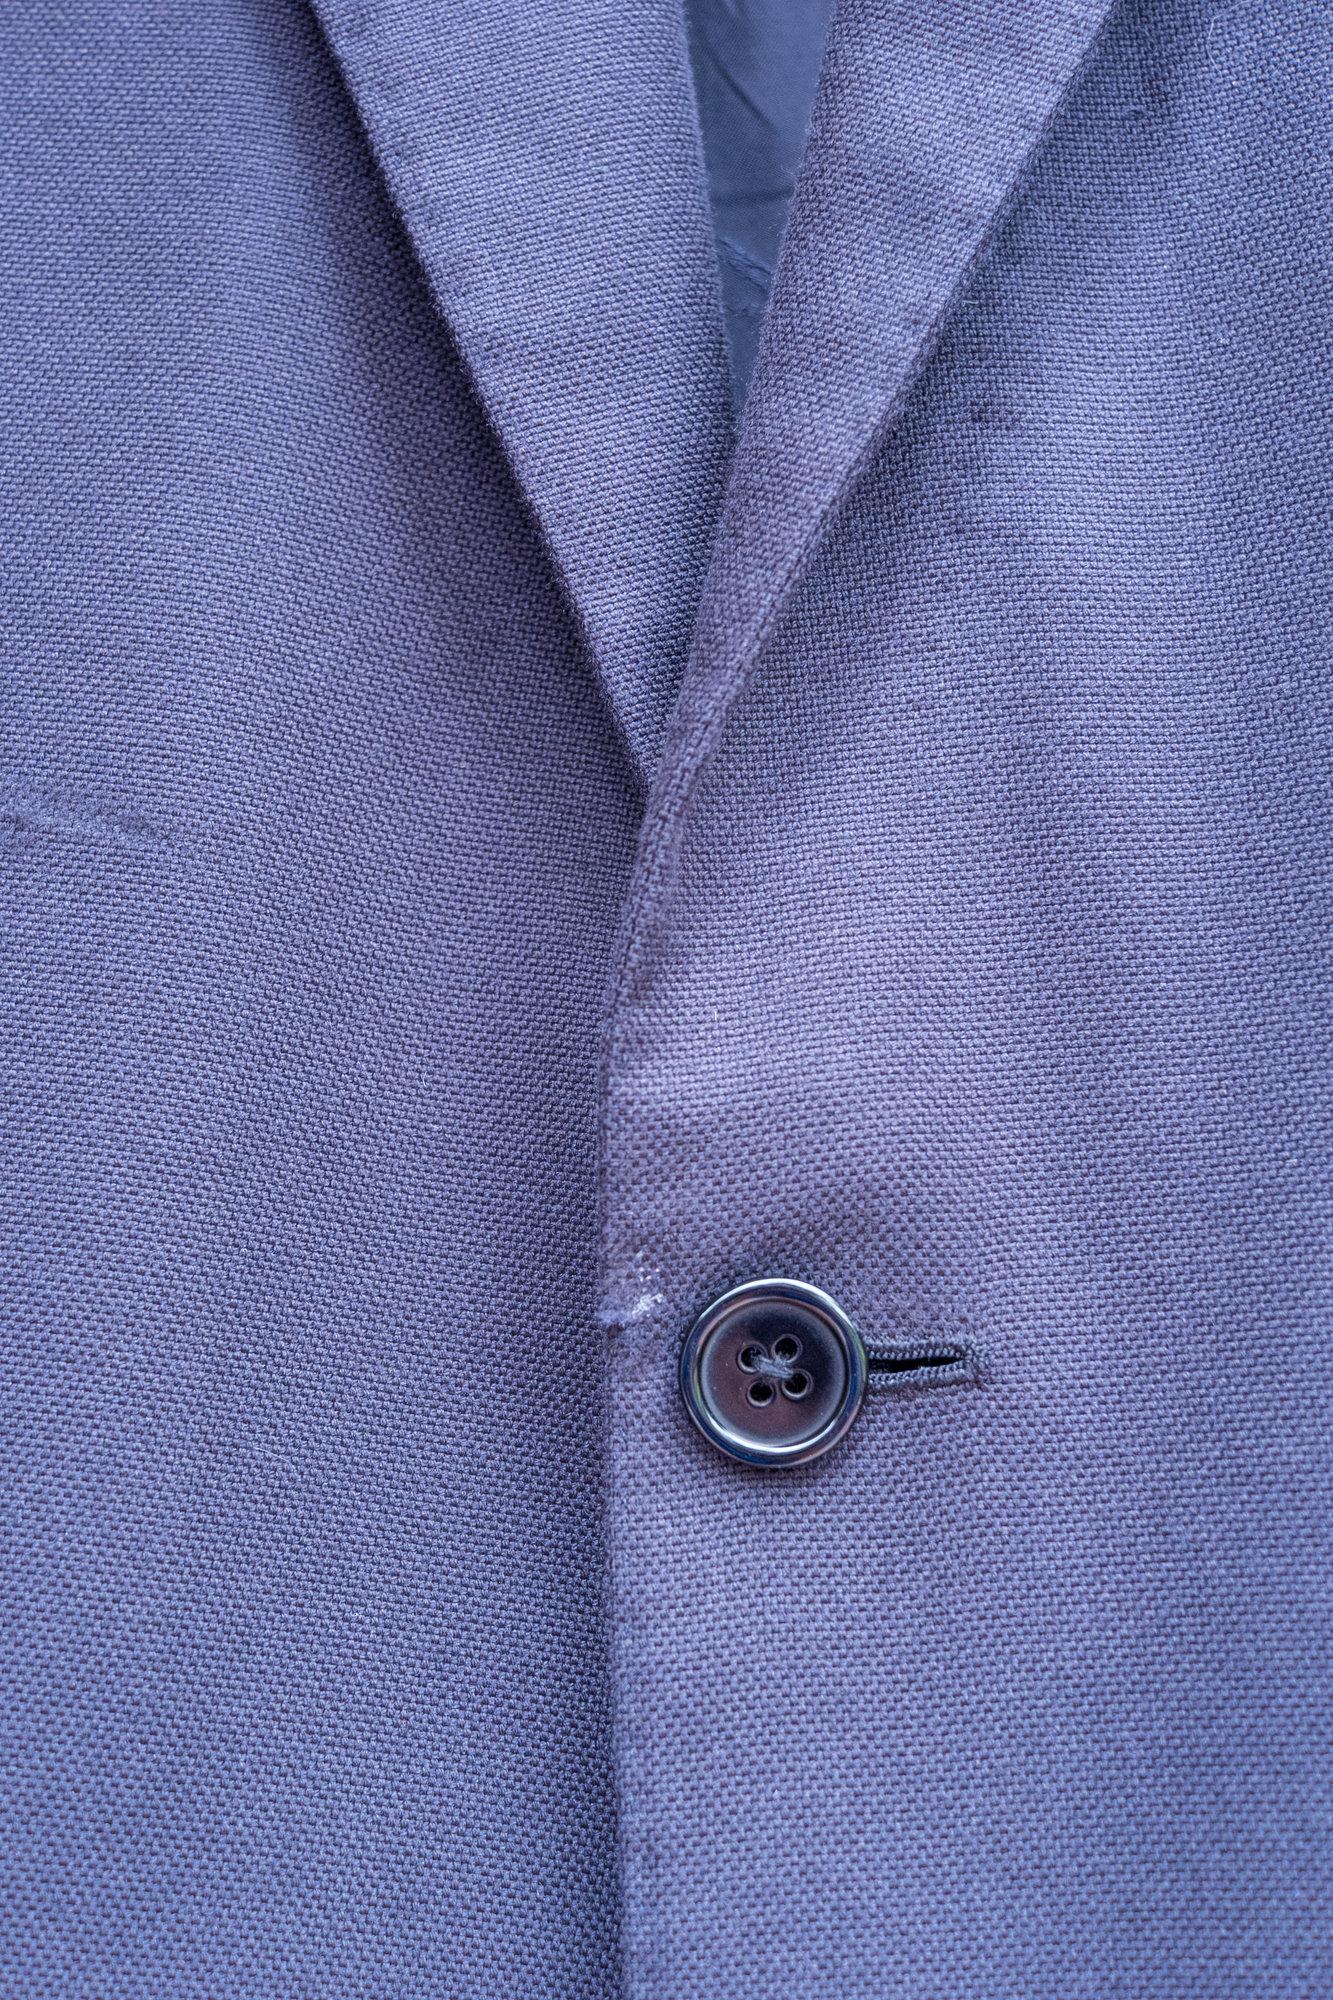 Kiton 52 R Cotton Blue Blazer-7.jpg